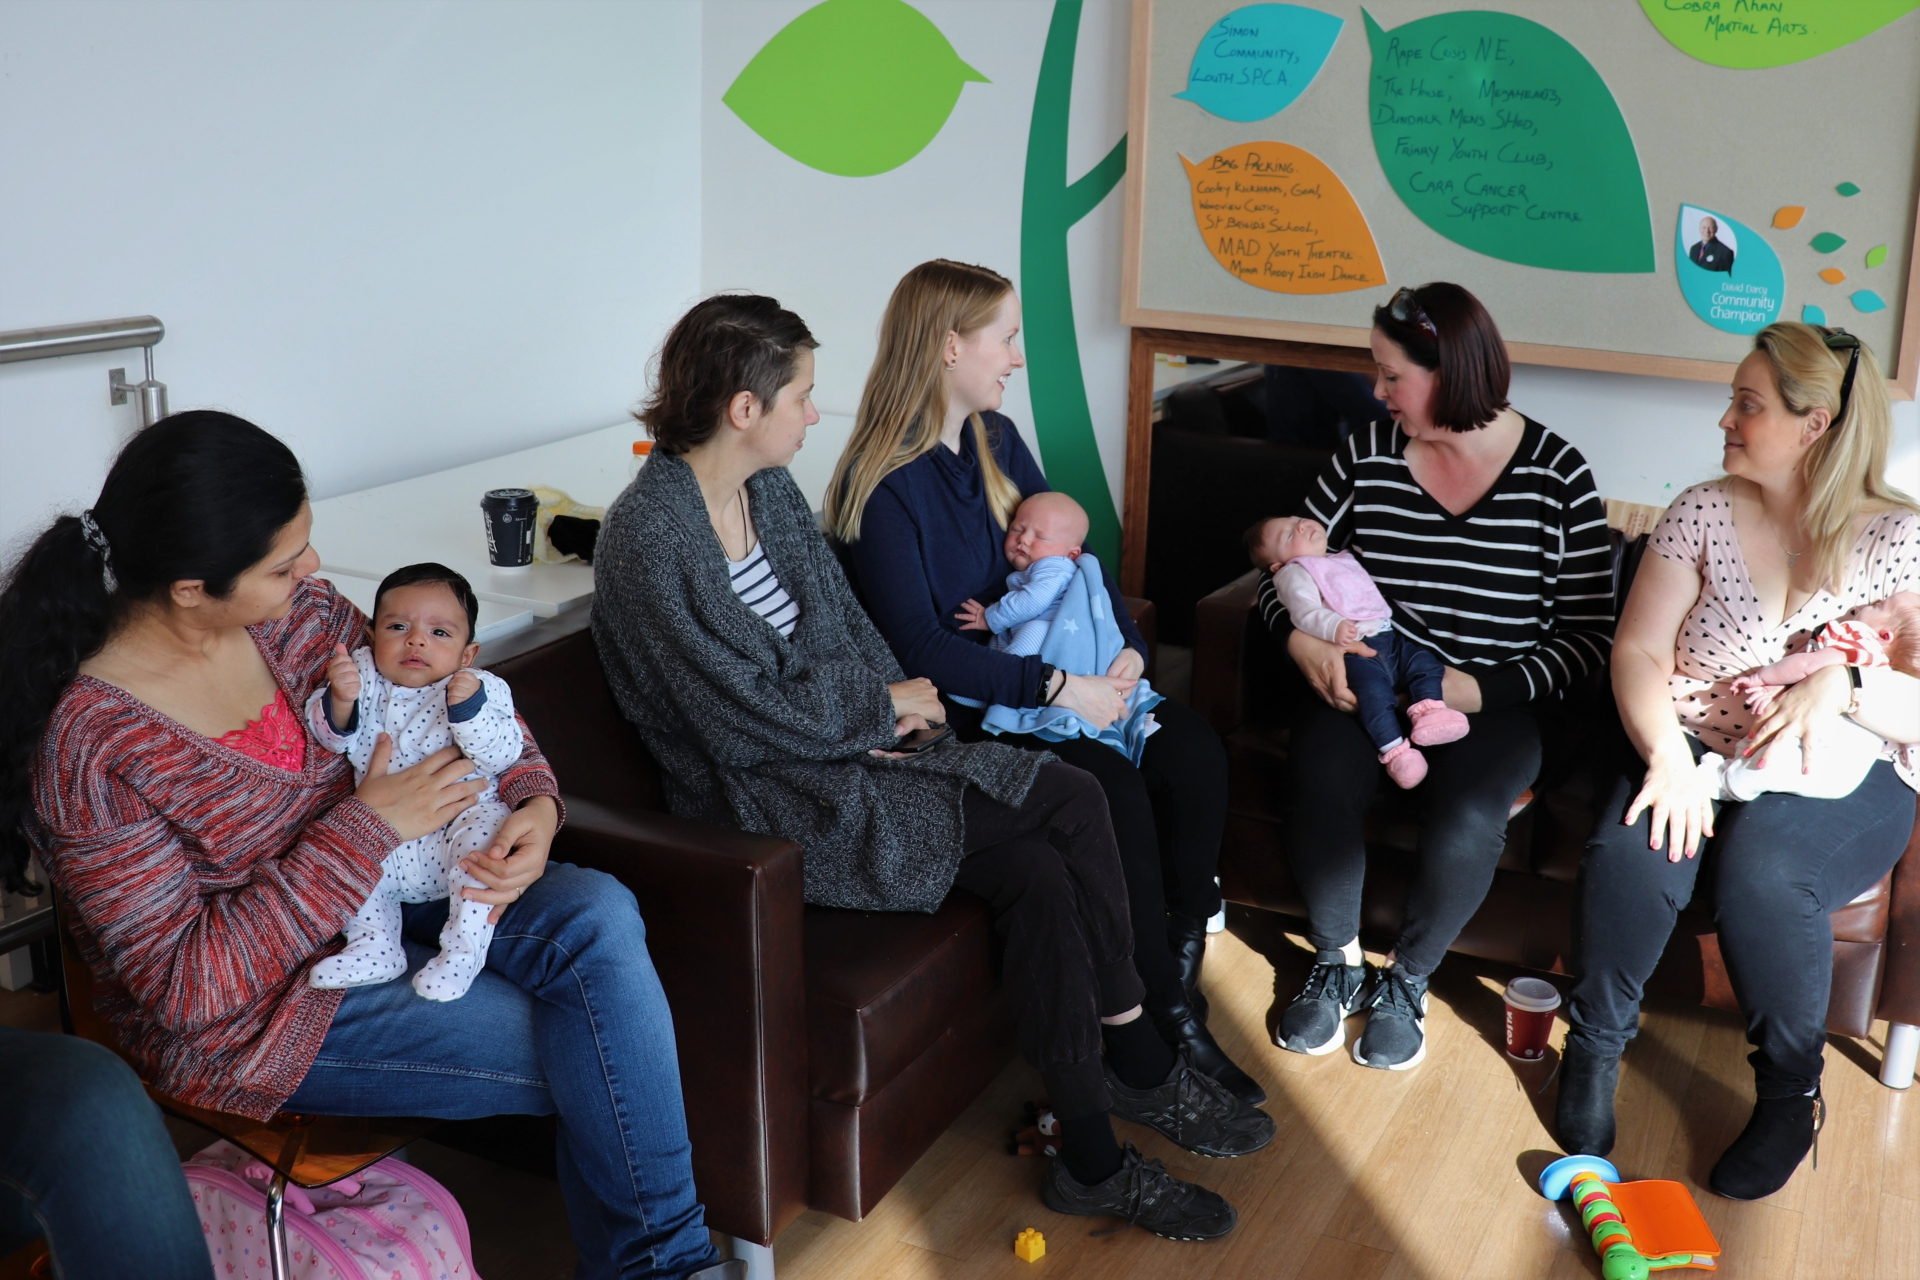 Adult breastfeeding chat